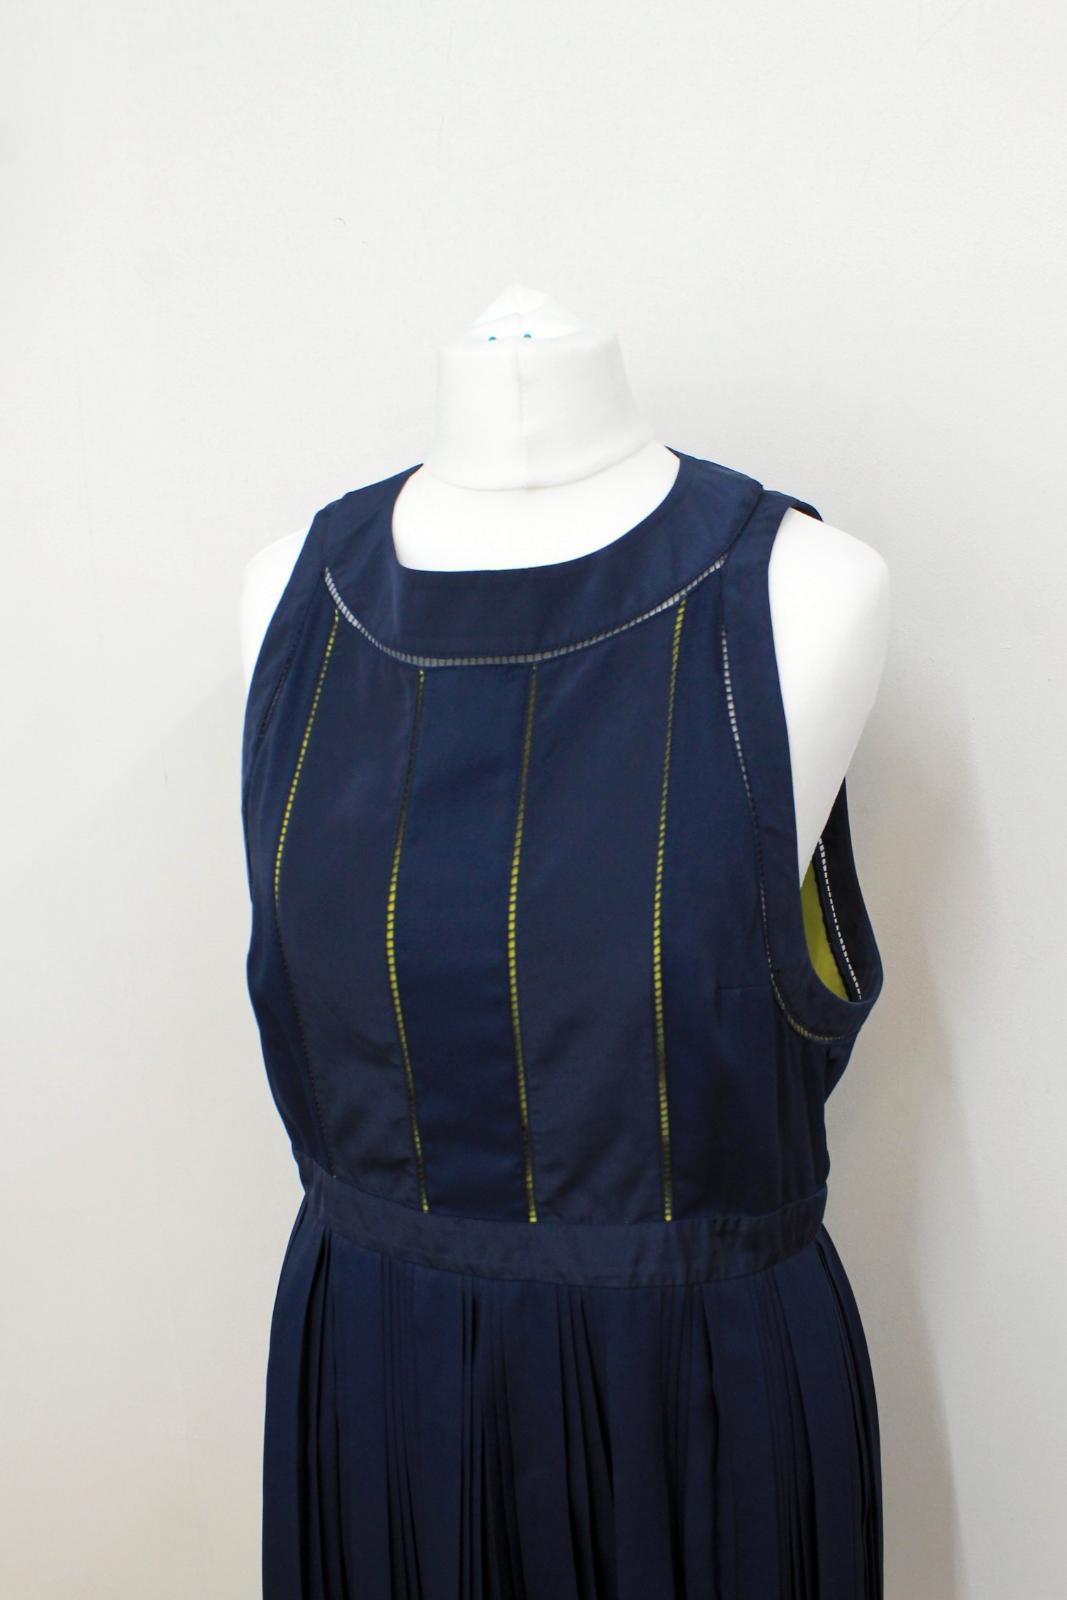 KENZO-PARIS-Ladies-Navy-Blue-Neon-Yellow-Sleeveless-Shift-Dress-FR42-UK14 thumbnail 7